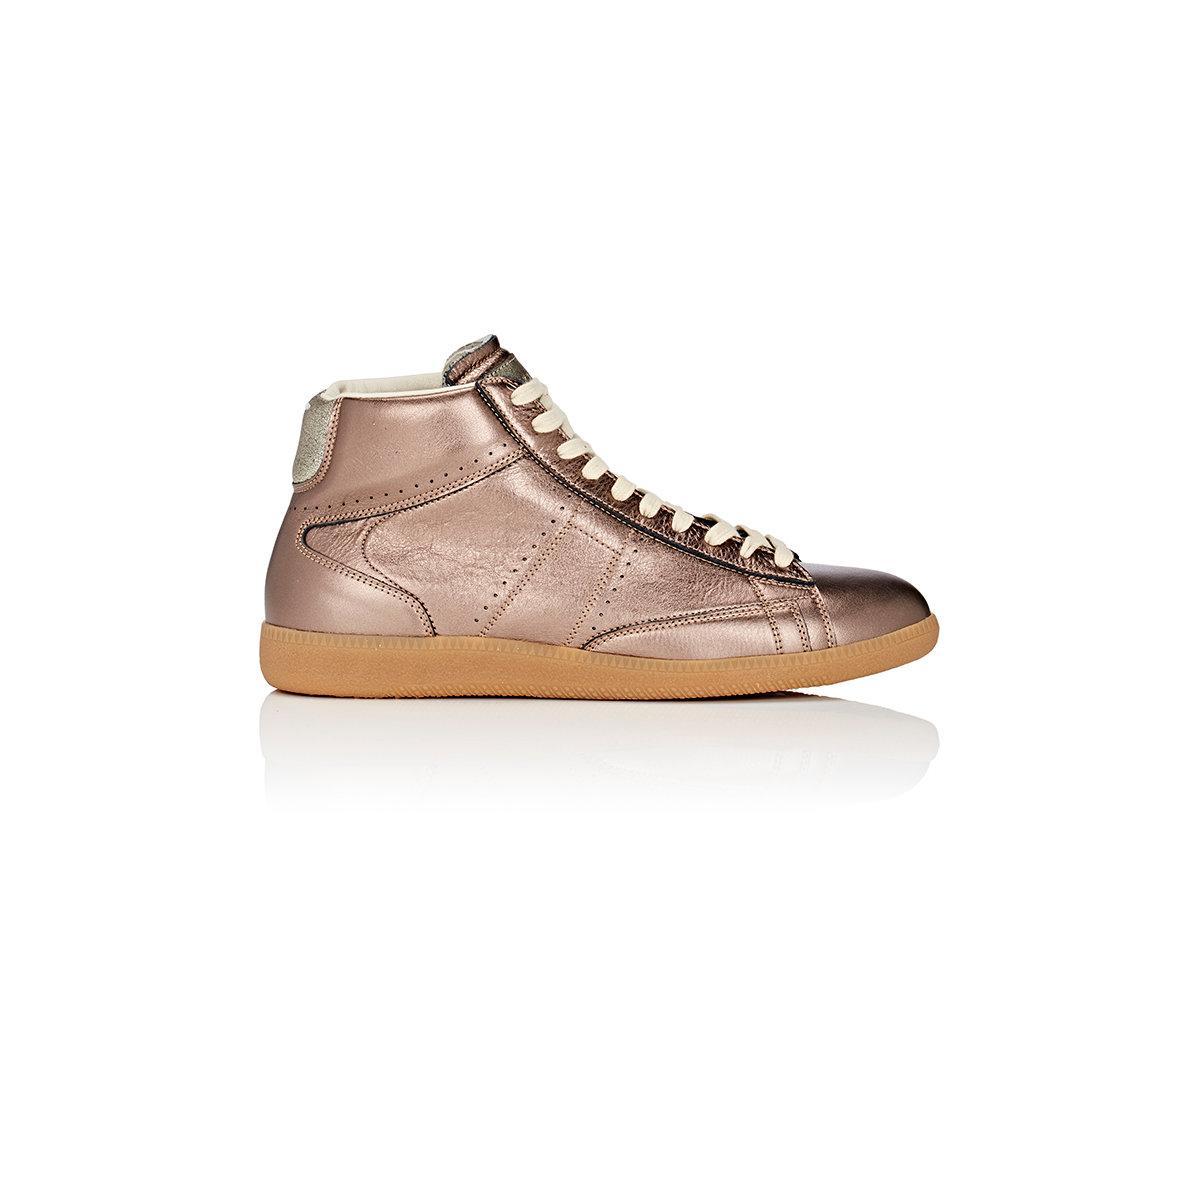 Maison margiela Replica Sneakers in Metallic | Lyst